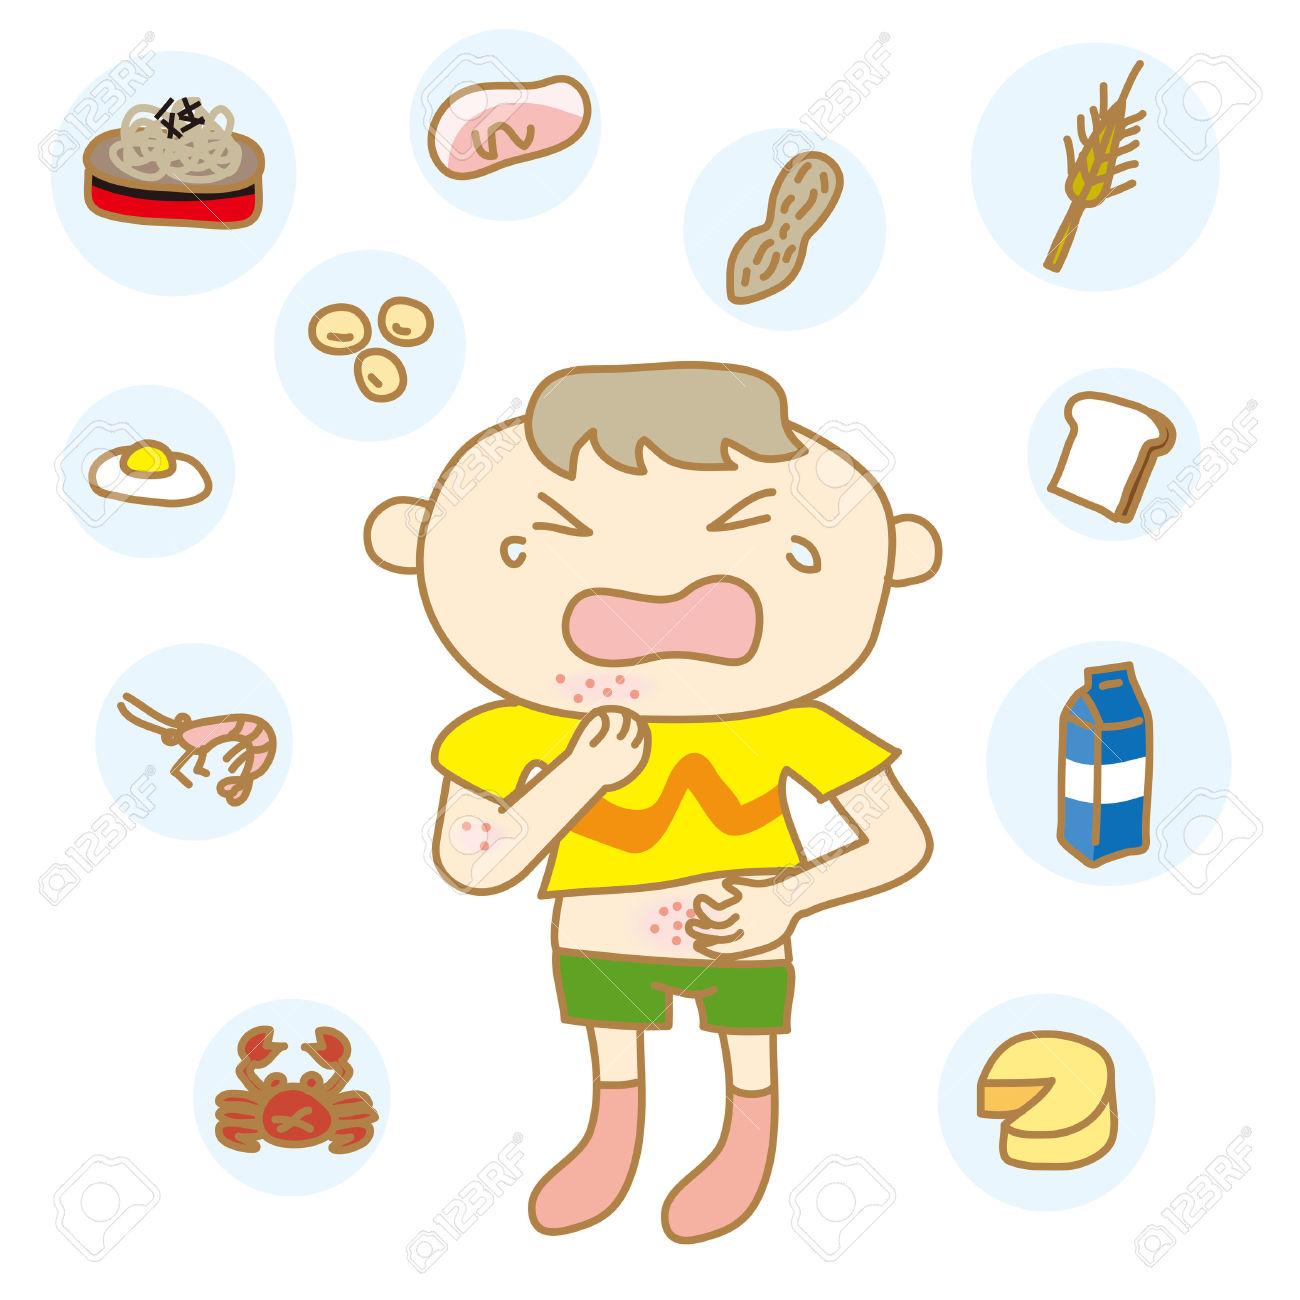 I Bambini Con Allergie Alimentari Clipart Royalty.